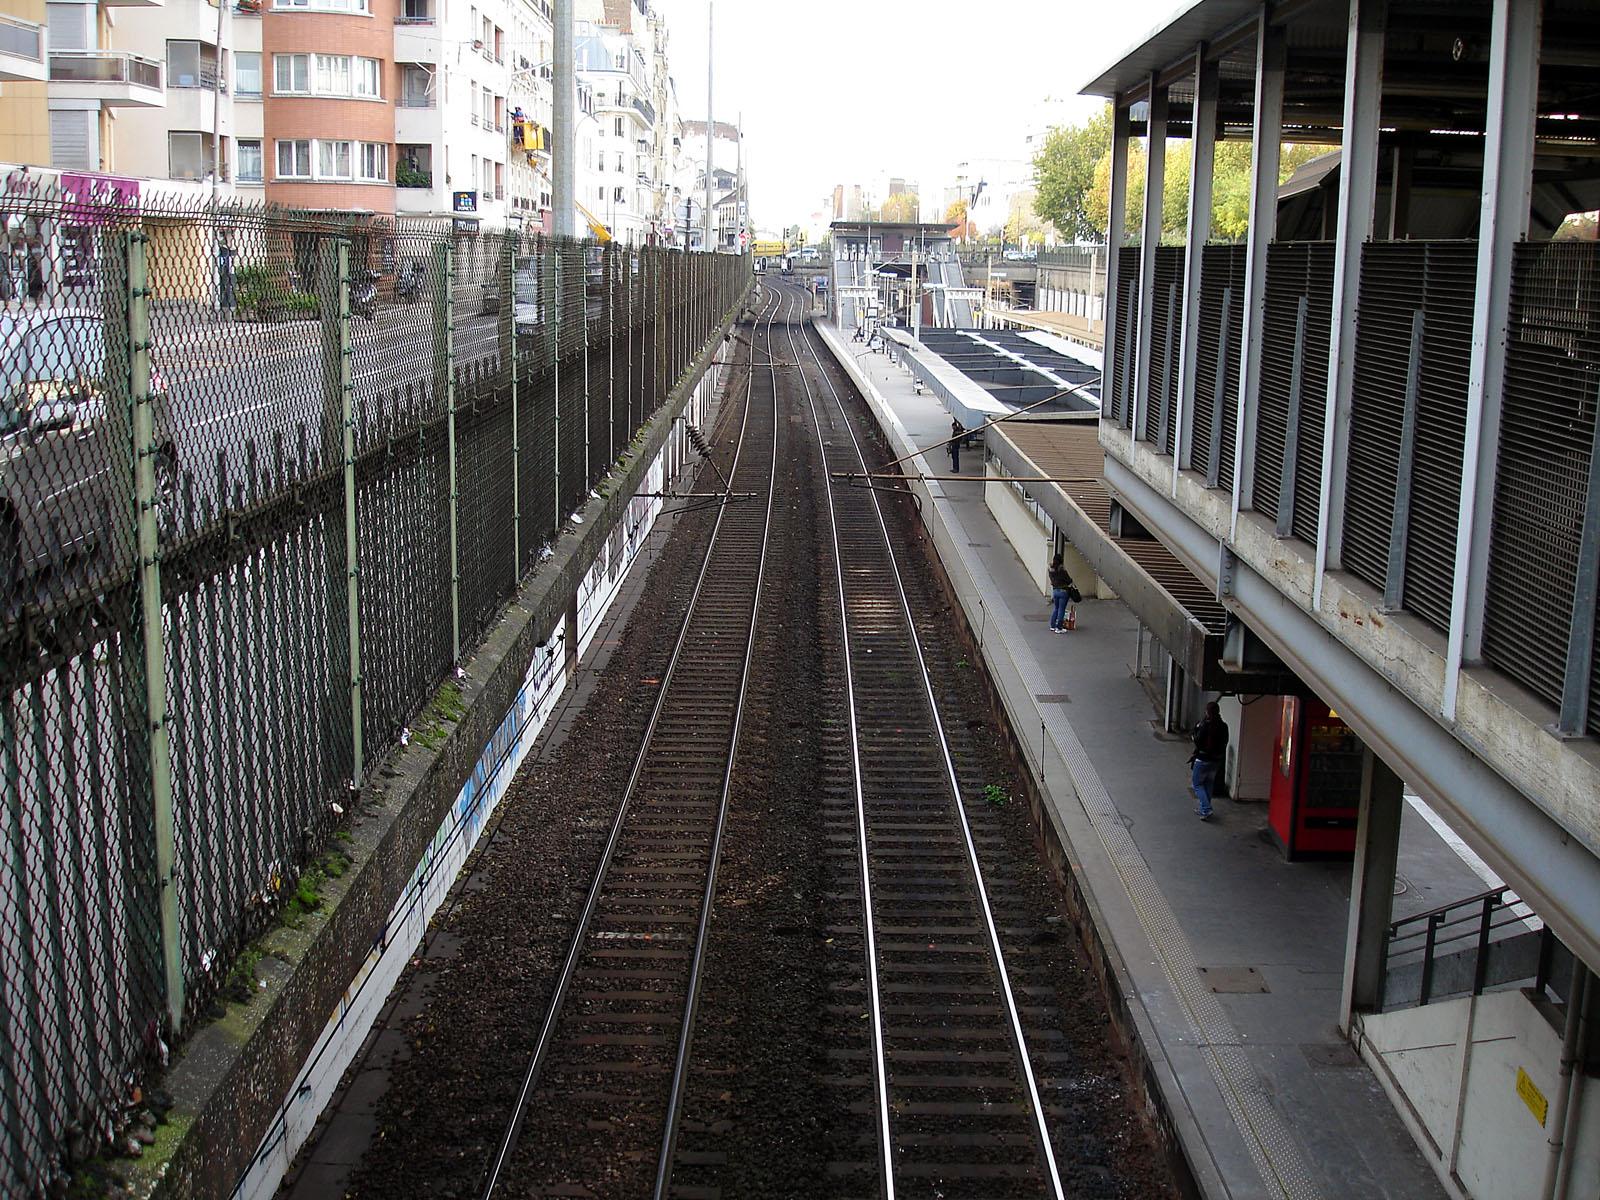 Gare De Bois Colombes - Gare de Bois Colombes